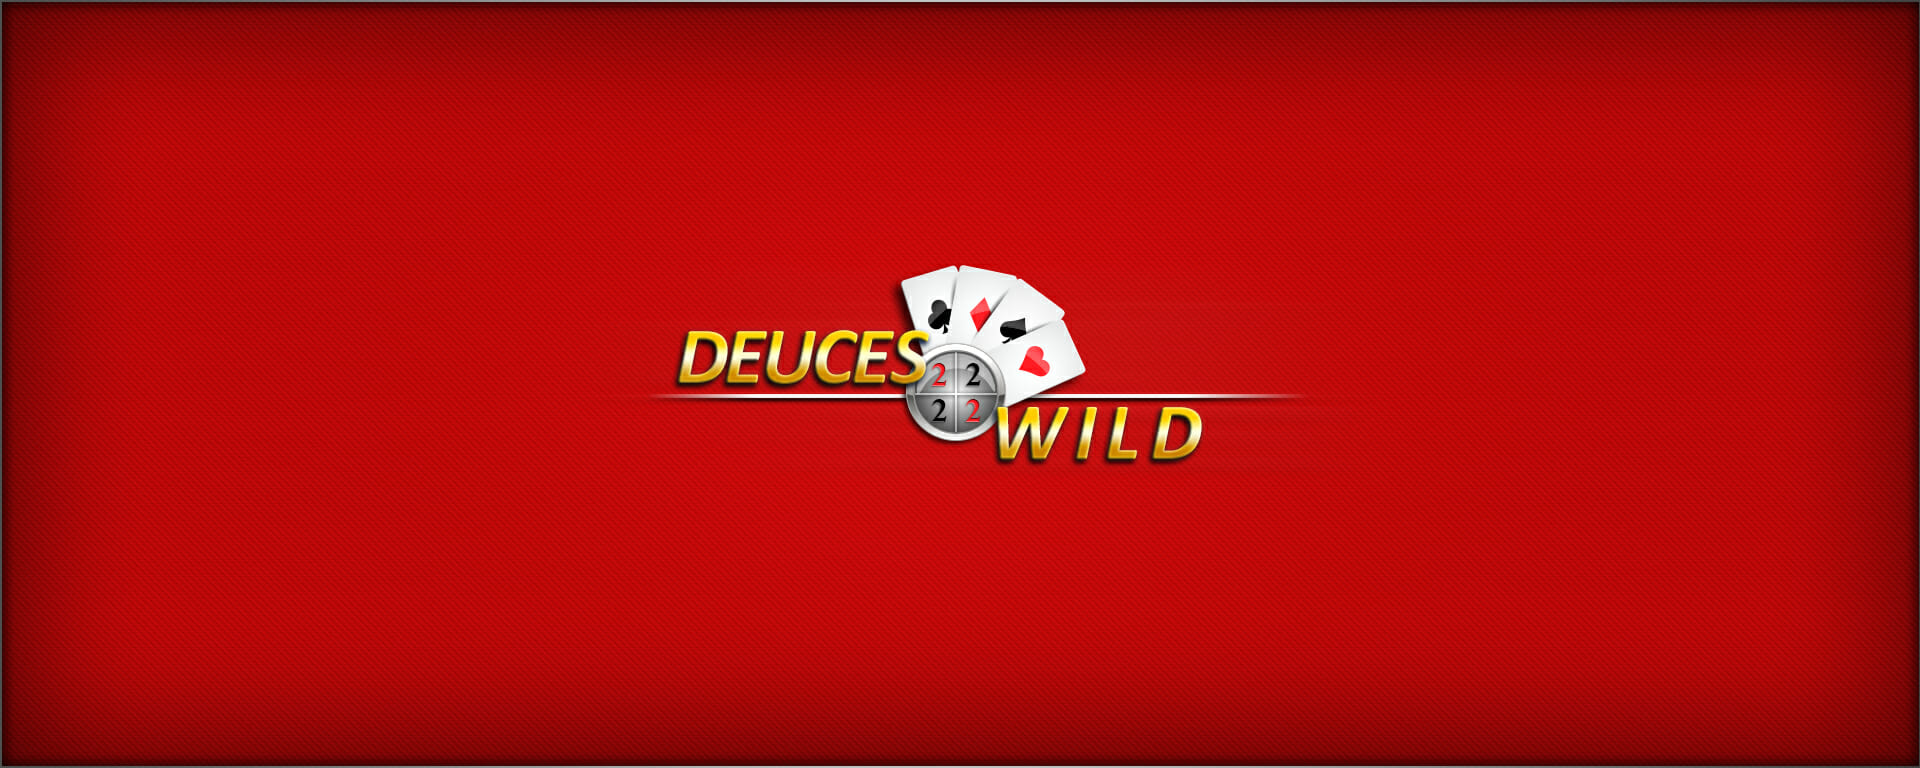 VideoPoker Deuces Wild